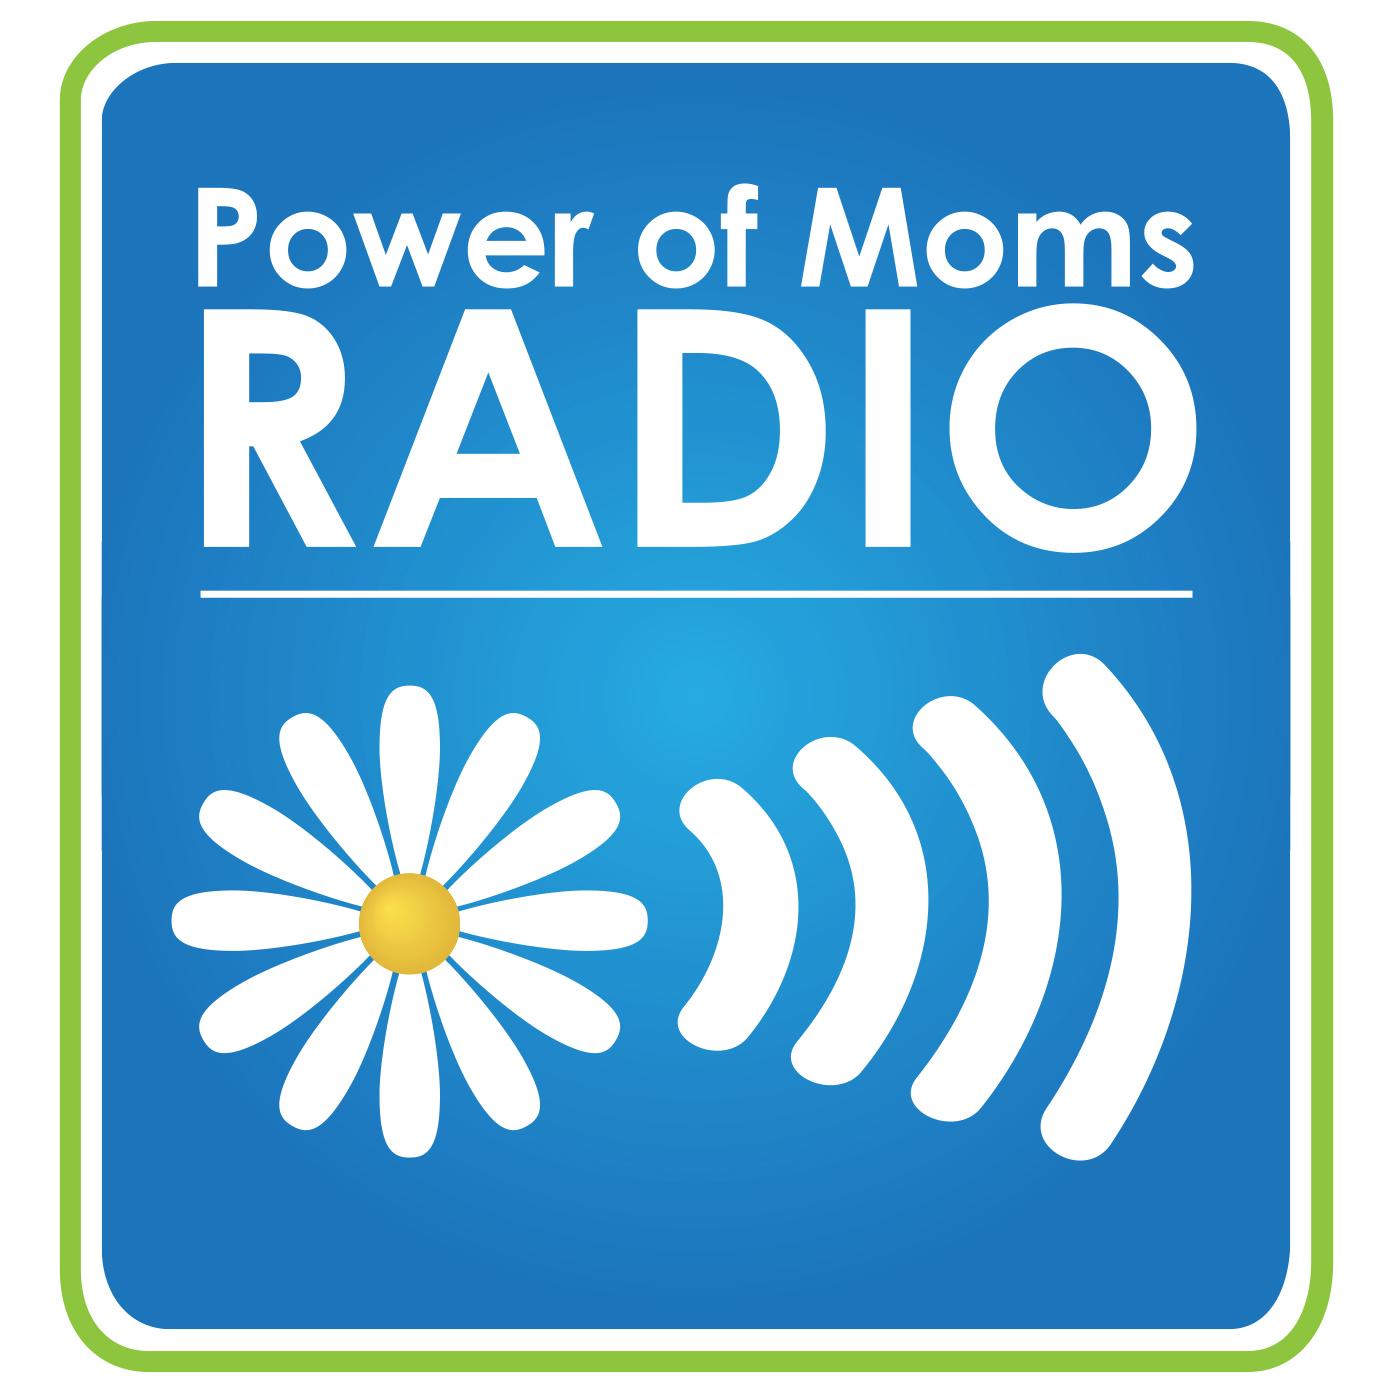 Power of Moms Radio logo